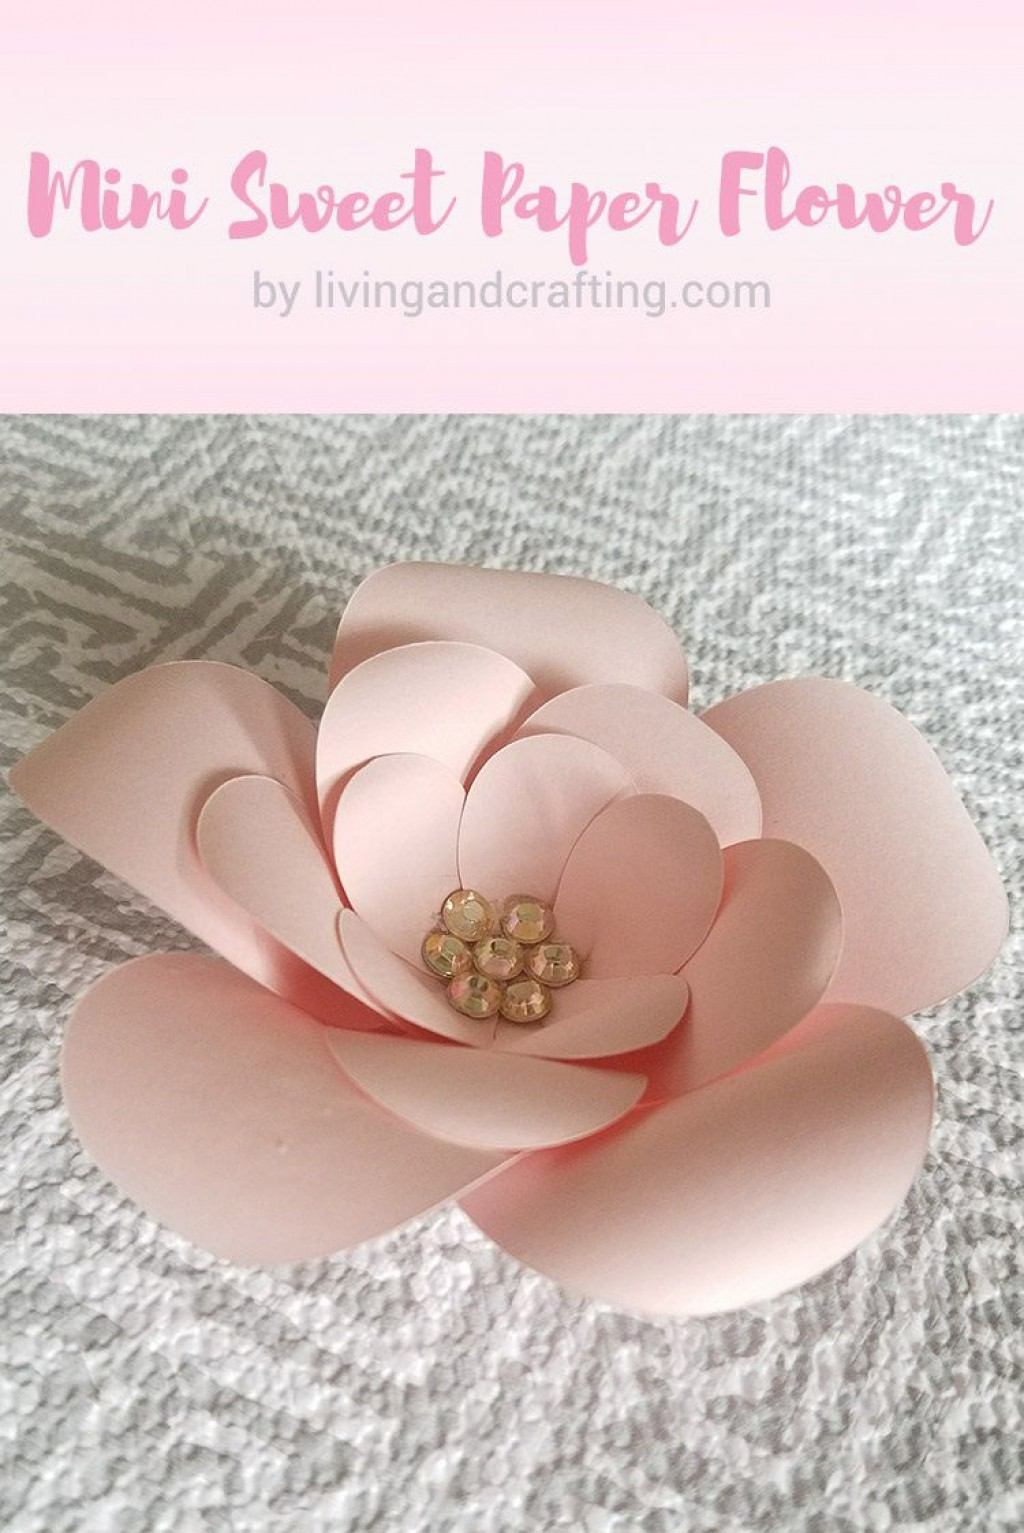 006 Wonderful Free Printable Diy Paper Flower Template Inspiration  TemplatesLarge